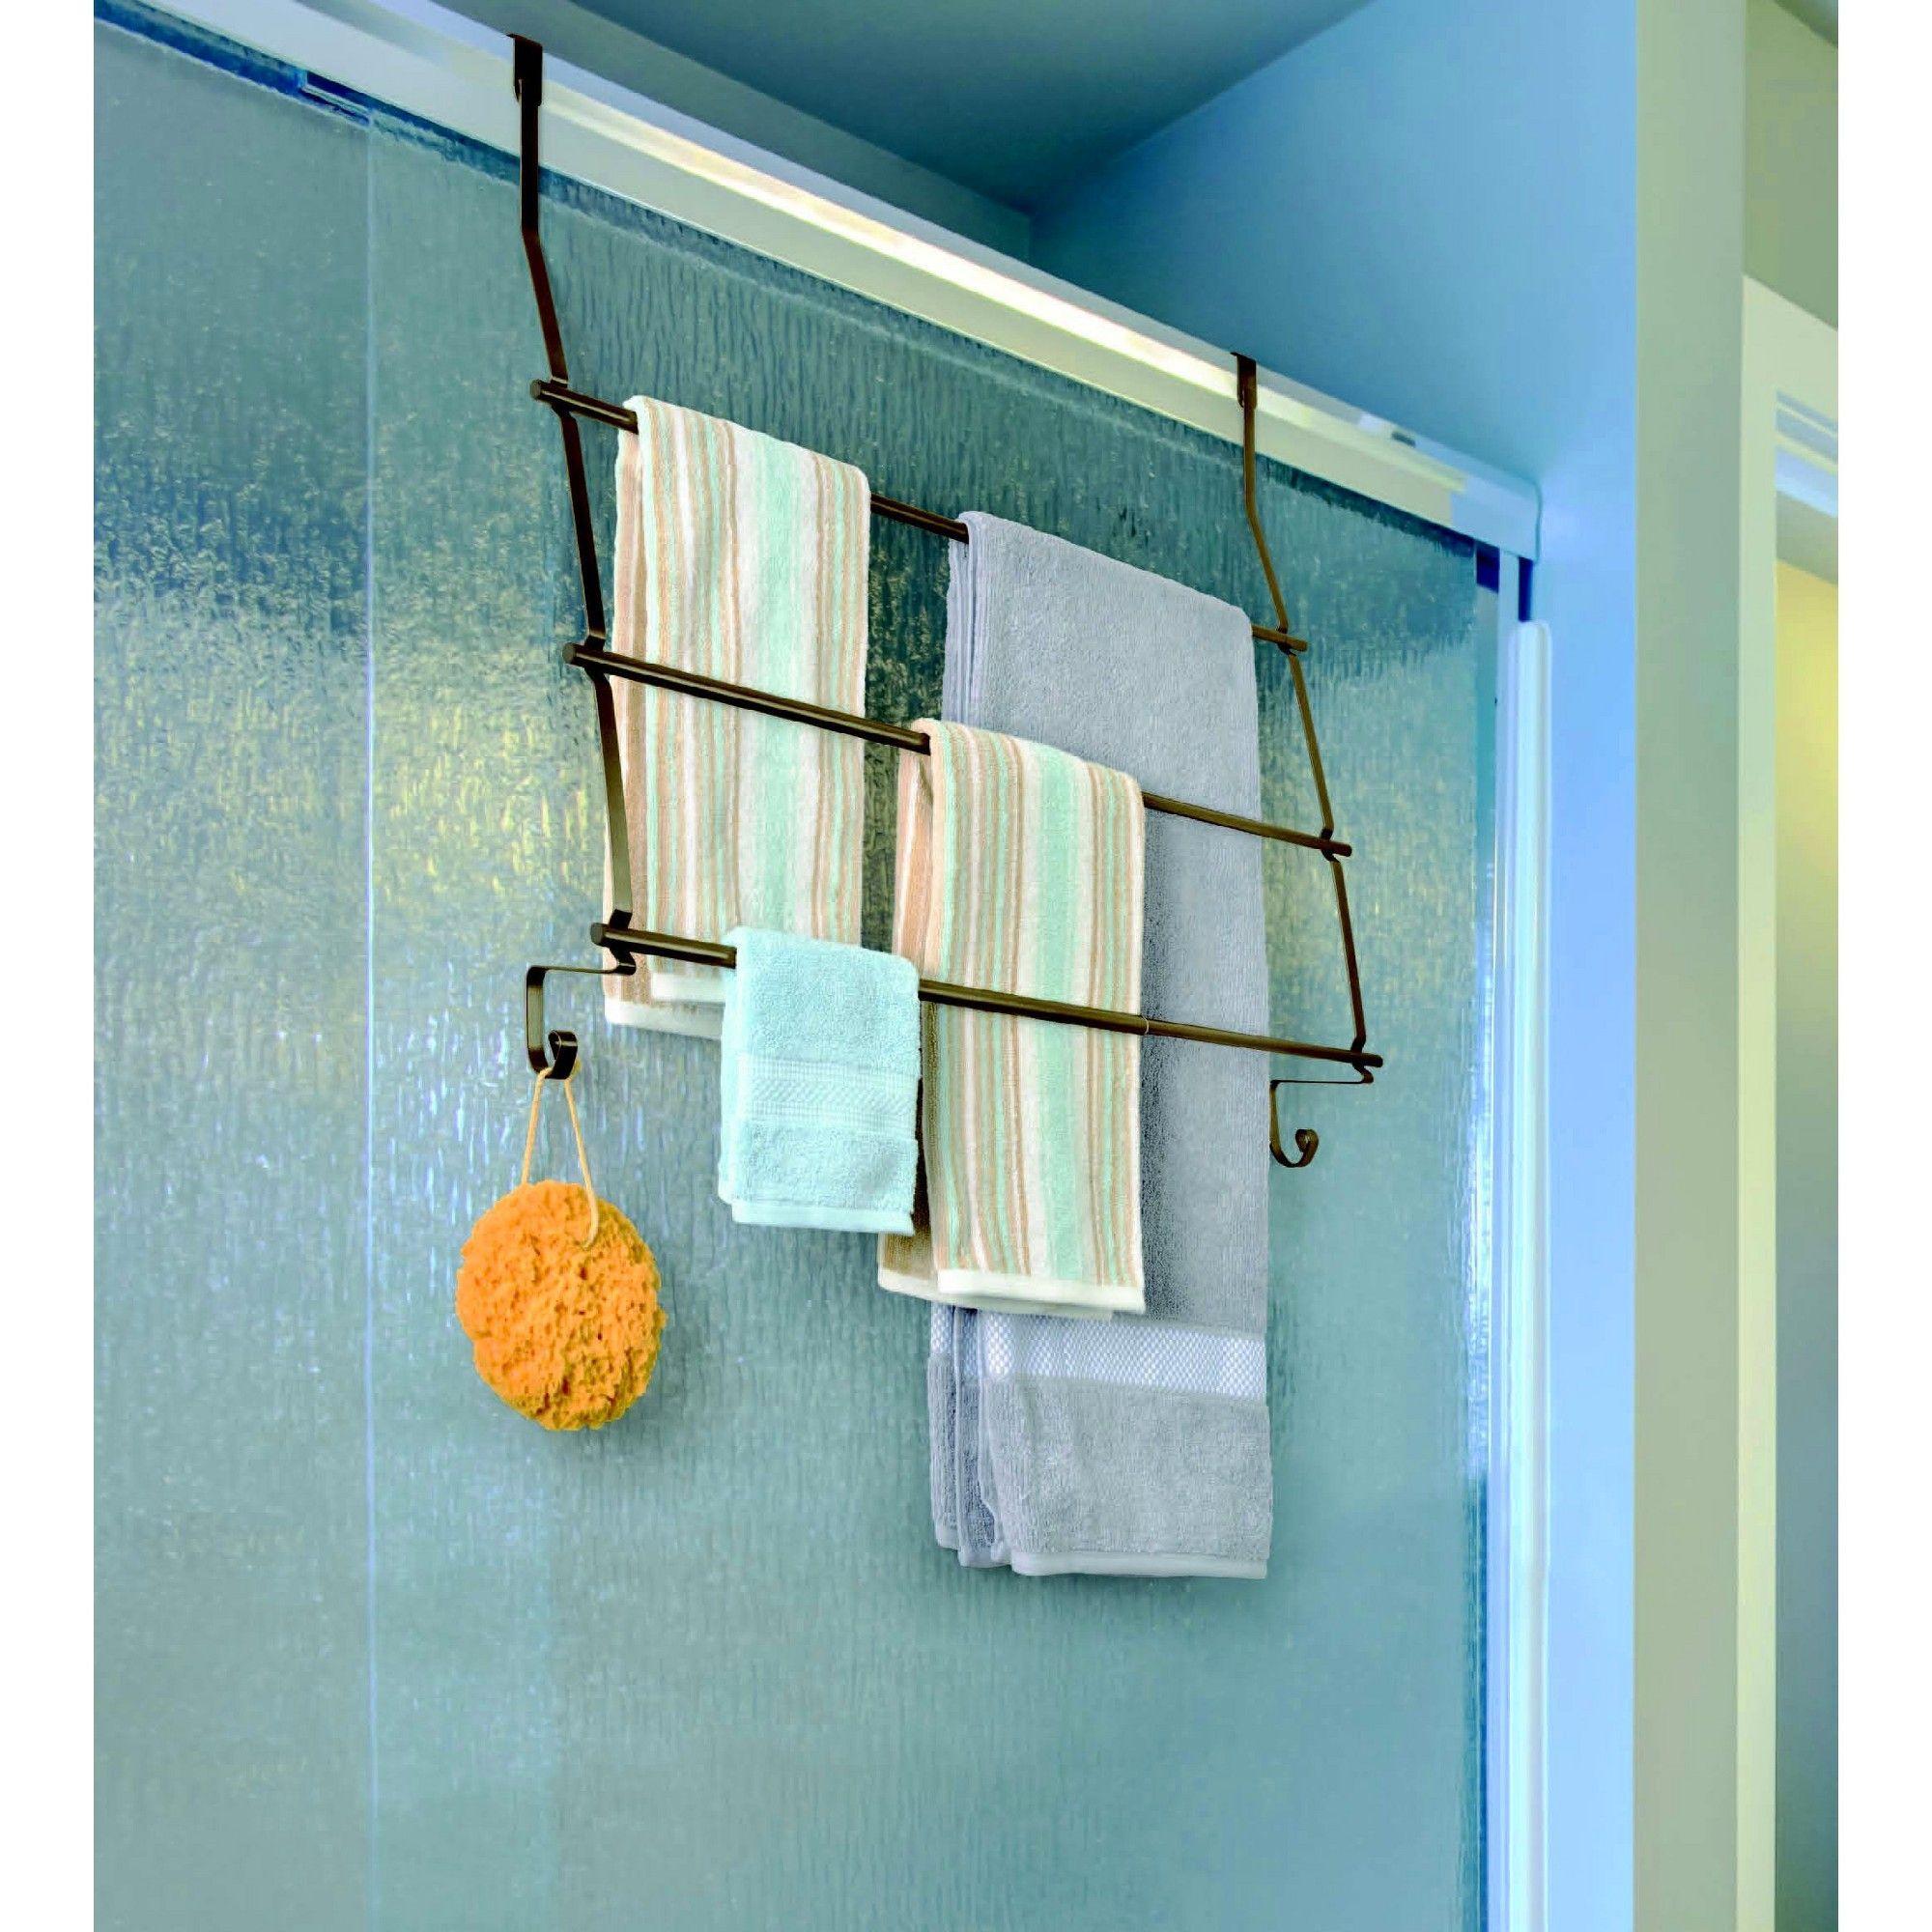 Fancy Towel Shelf And Rack Motif - Bathtub Ideas - dilata.info